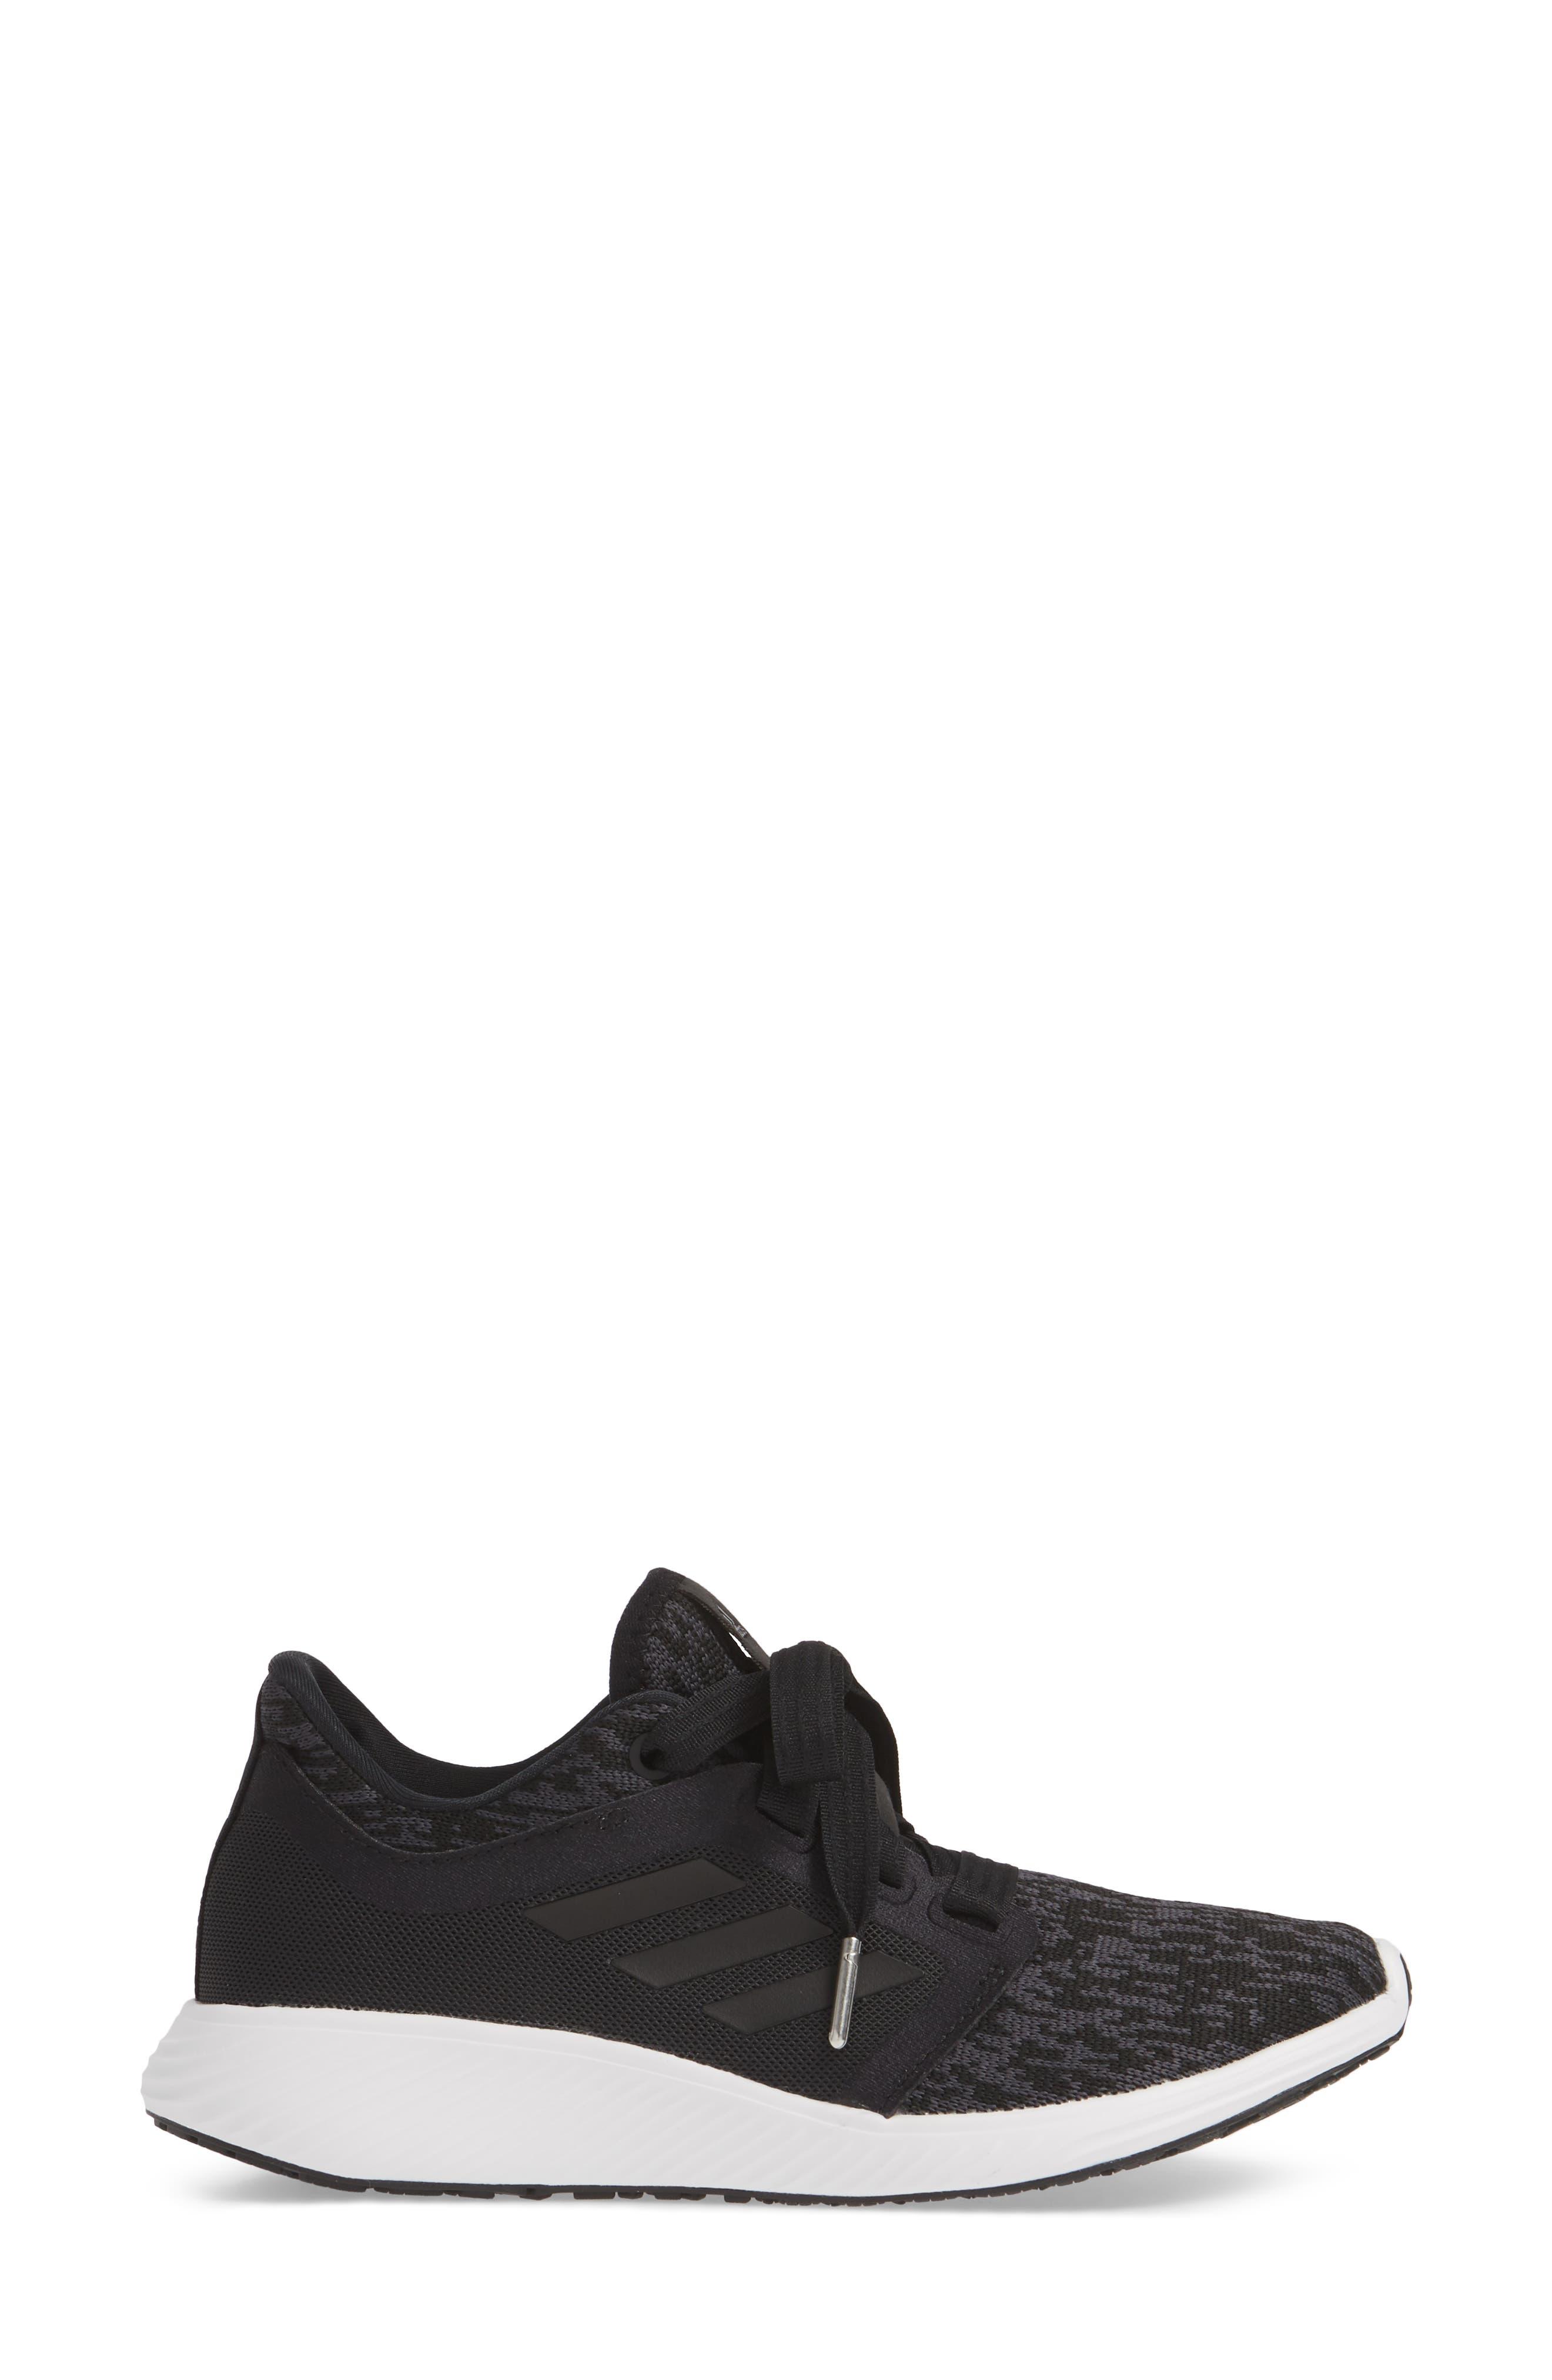 ADIDAS,                             Edge Lux 3 Running Shoe,                             Alternate thumbnail 3, color,                             CORE BLACK/ WHITE